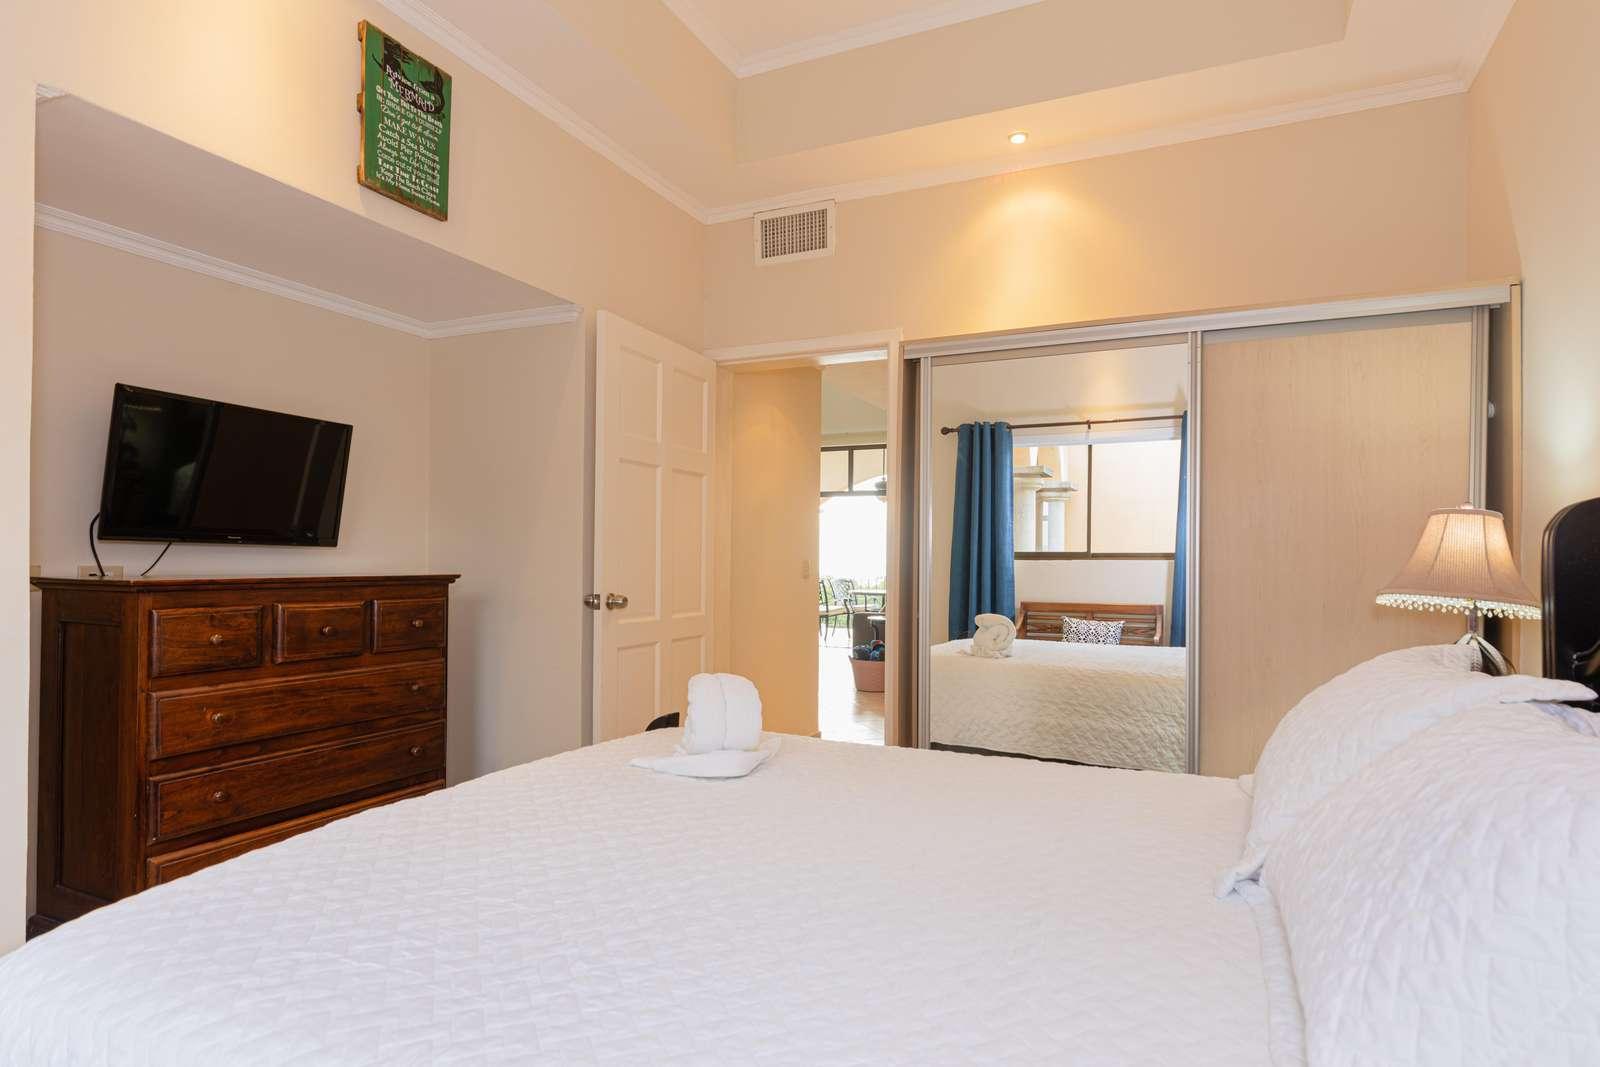 Another view of the guest bedroom, queen bed, Smart TV